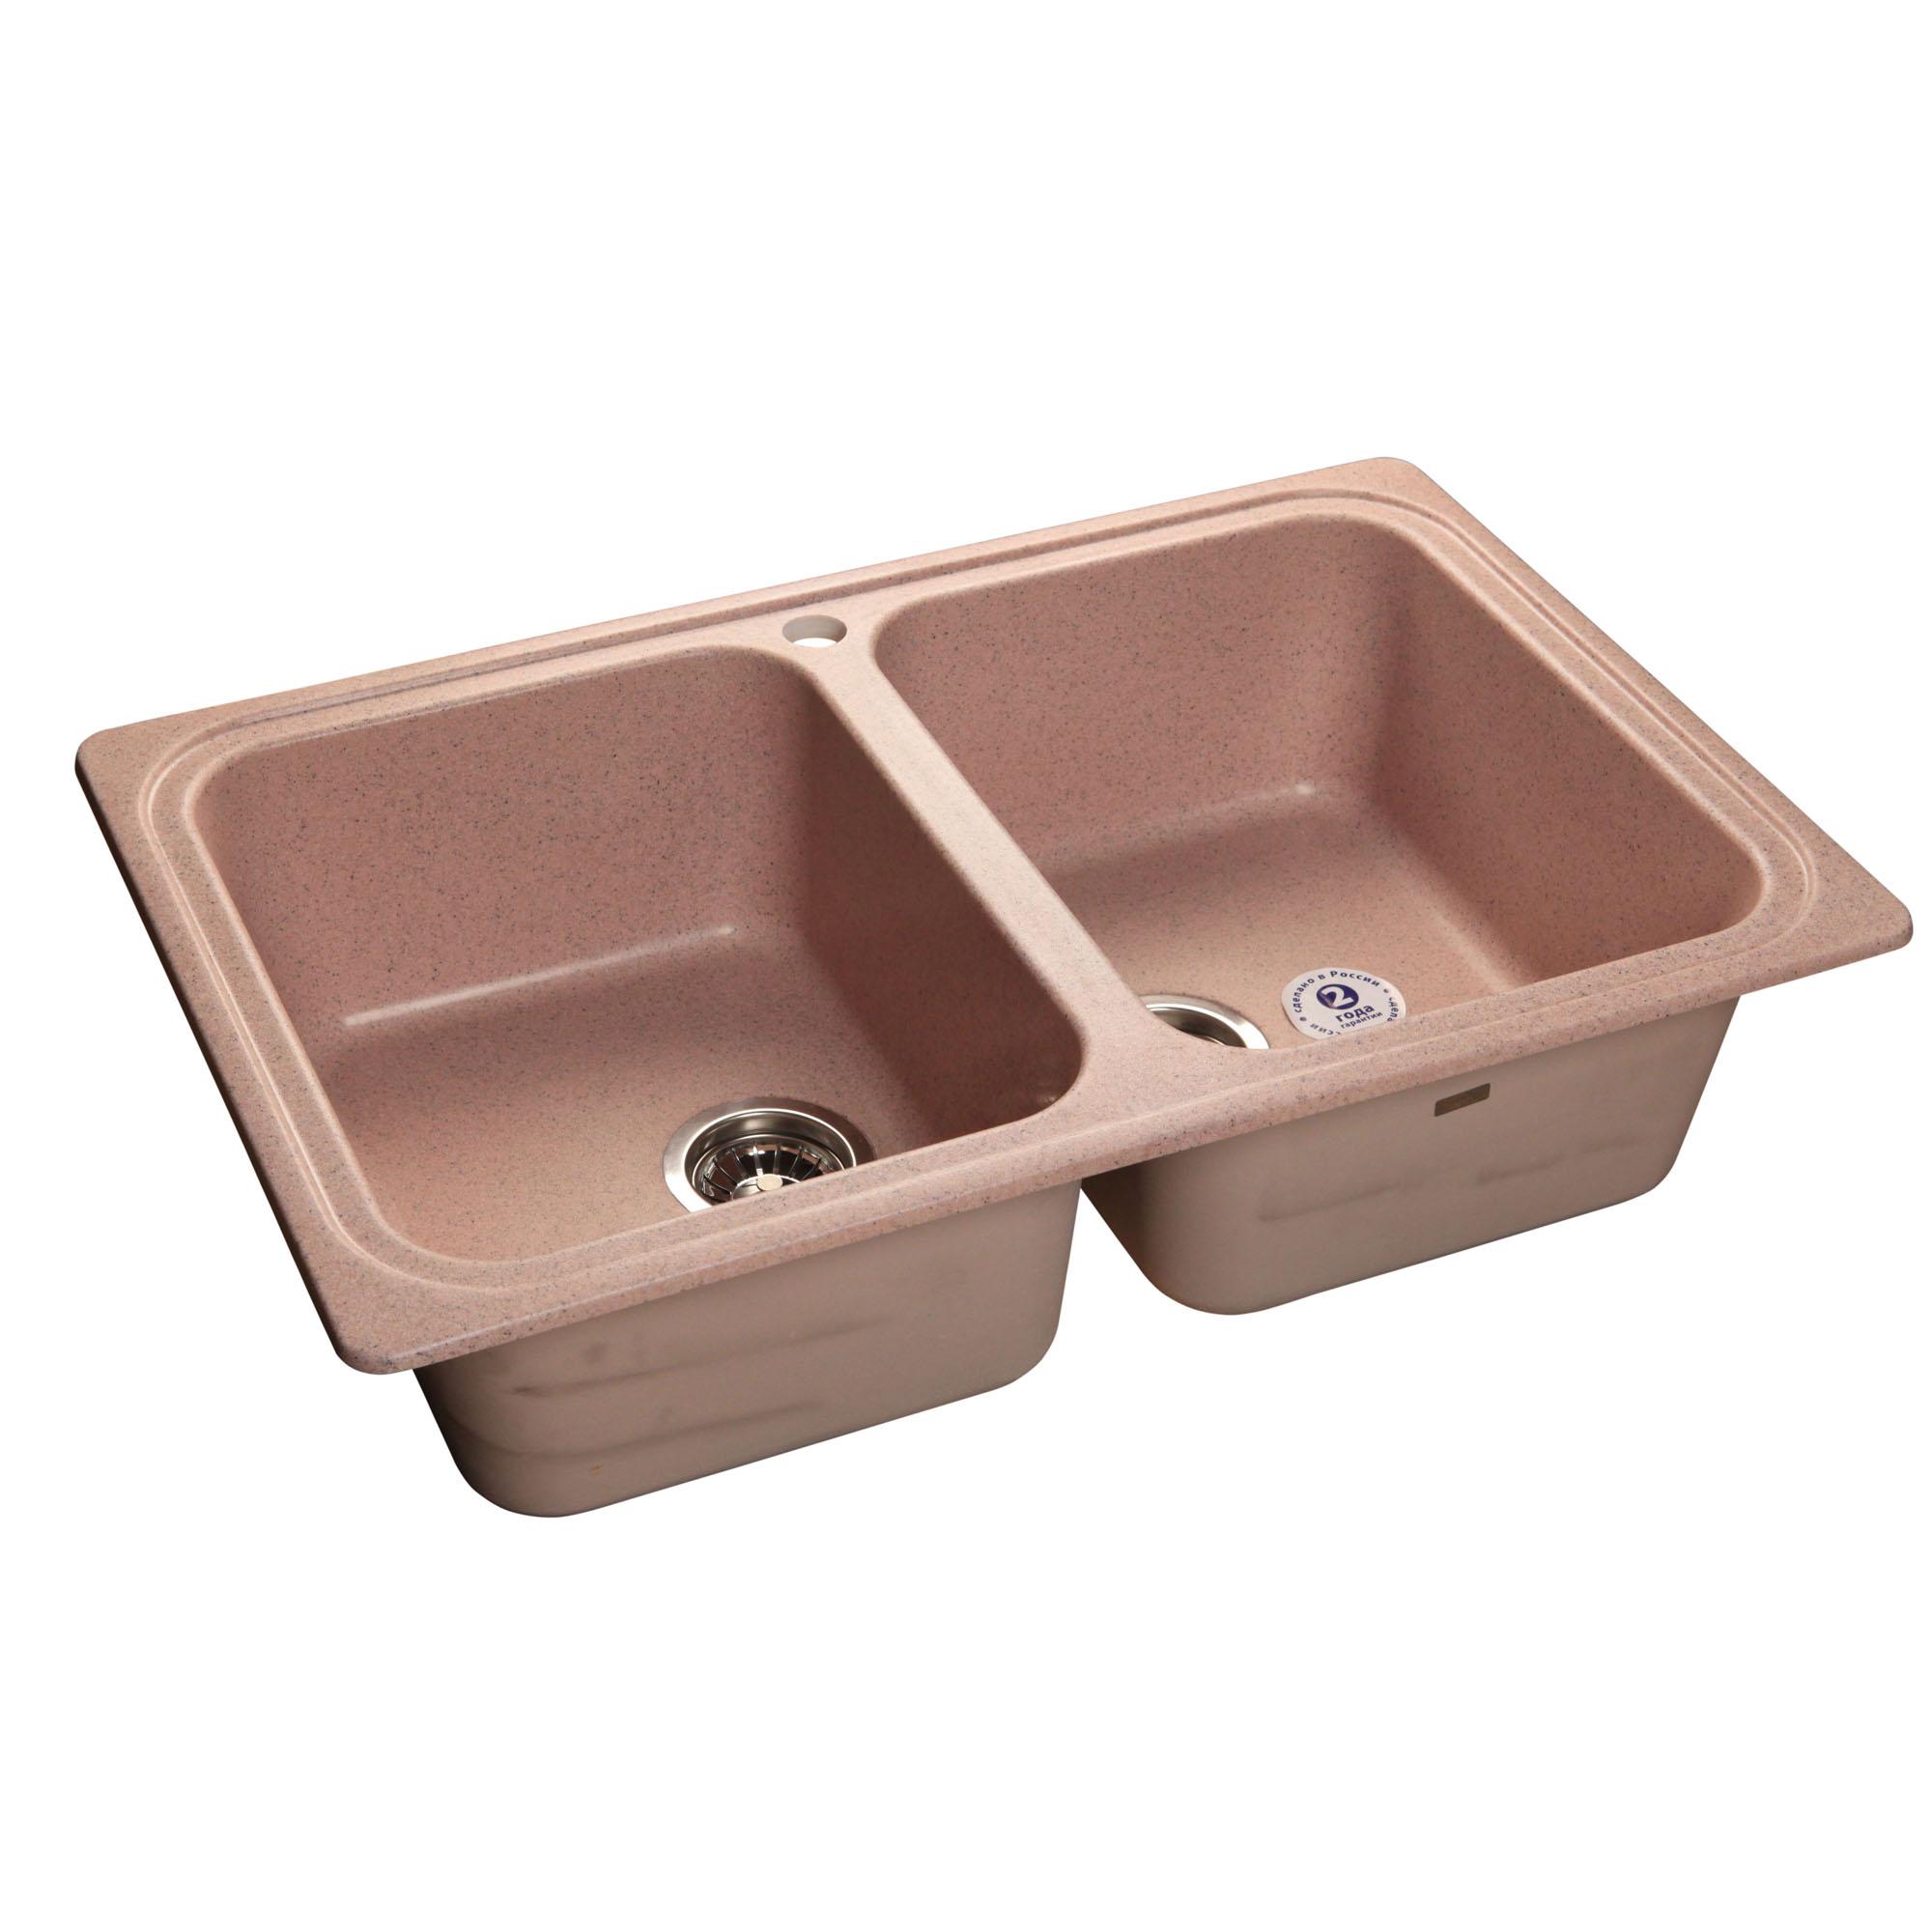 Кухонная мойка GranFest Standart GF-S780K розовый мойка кухонная granfest гранит 780x510 gf s780k бежевая